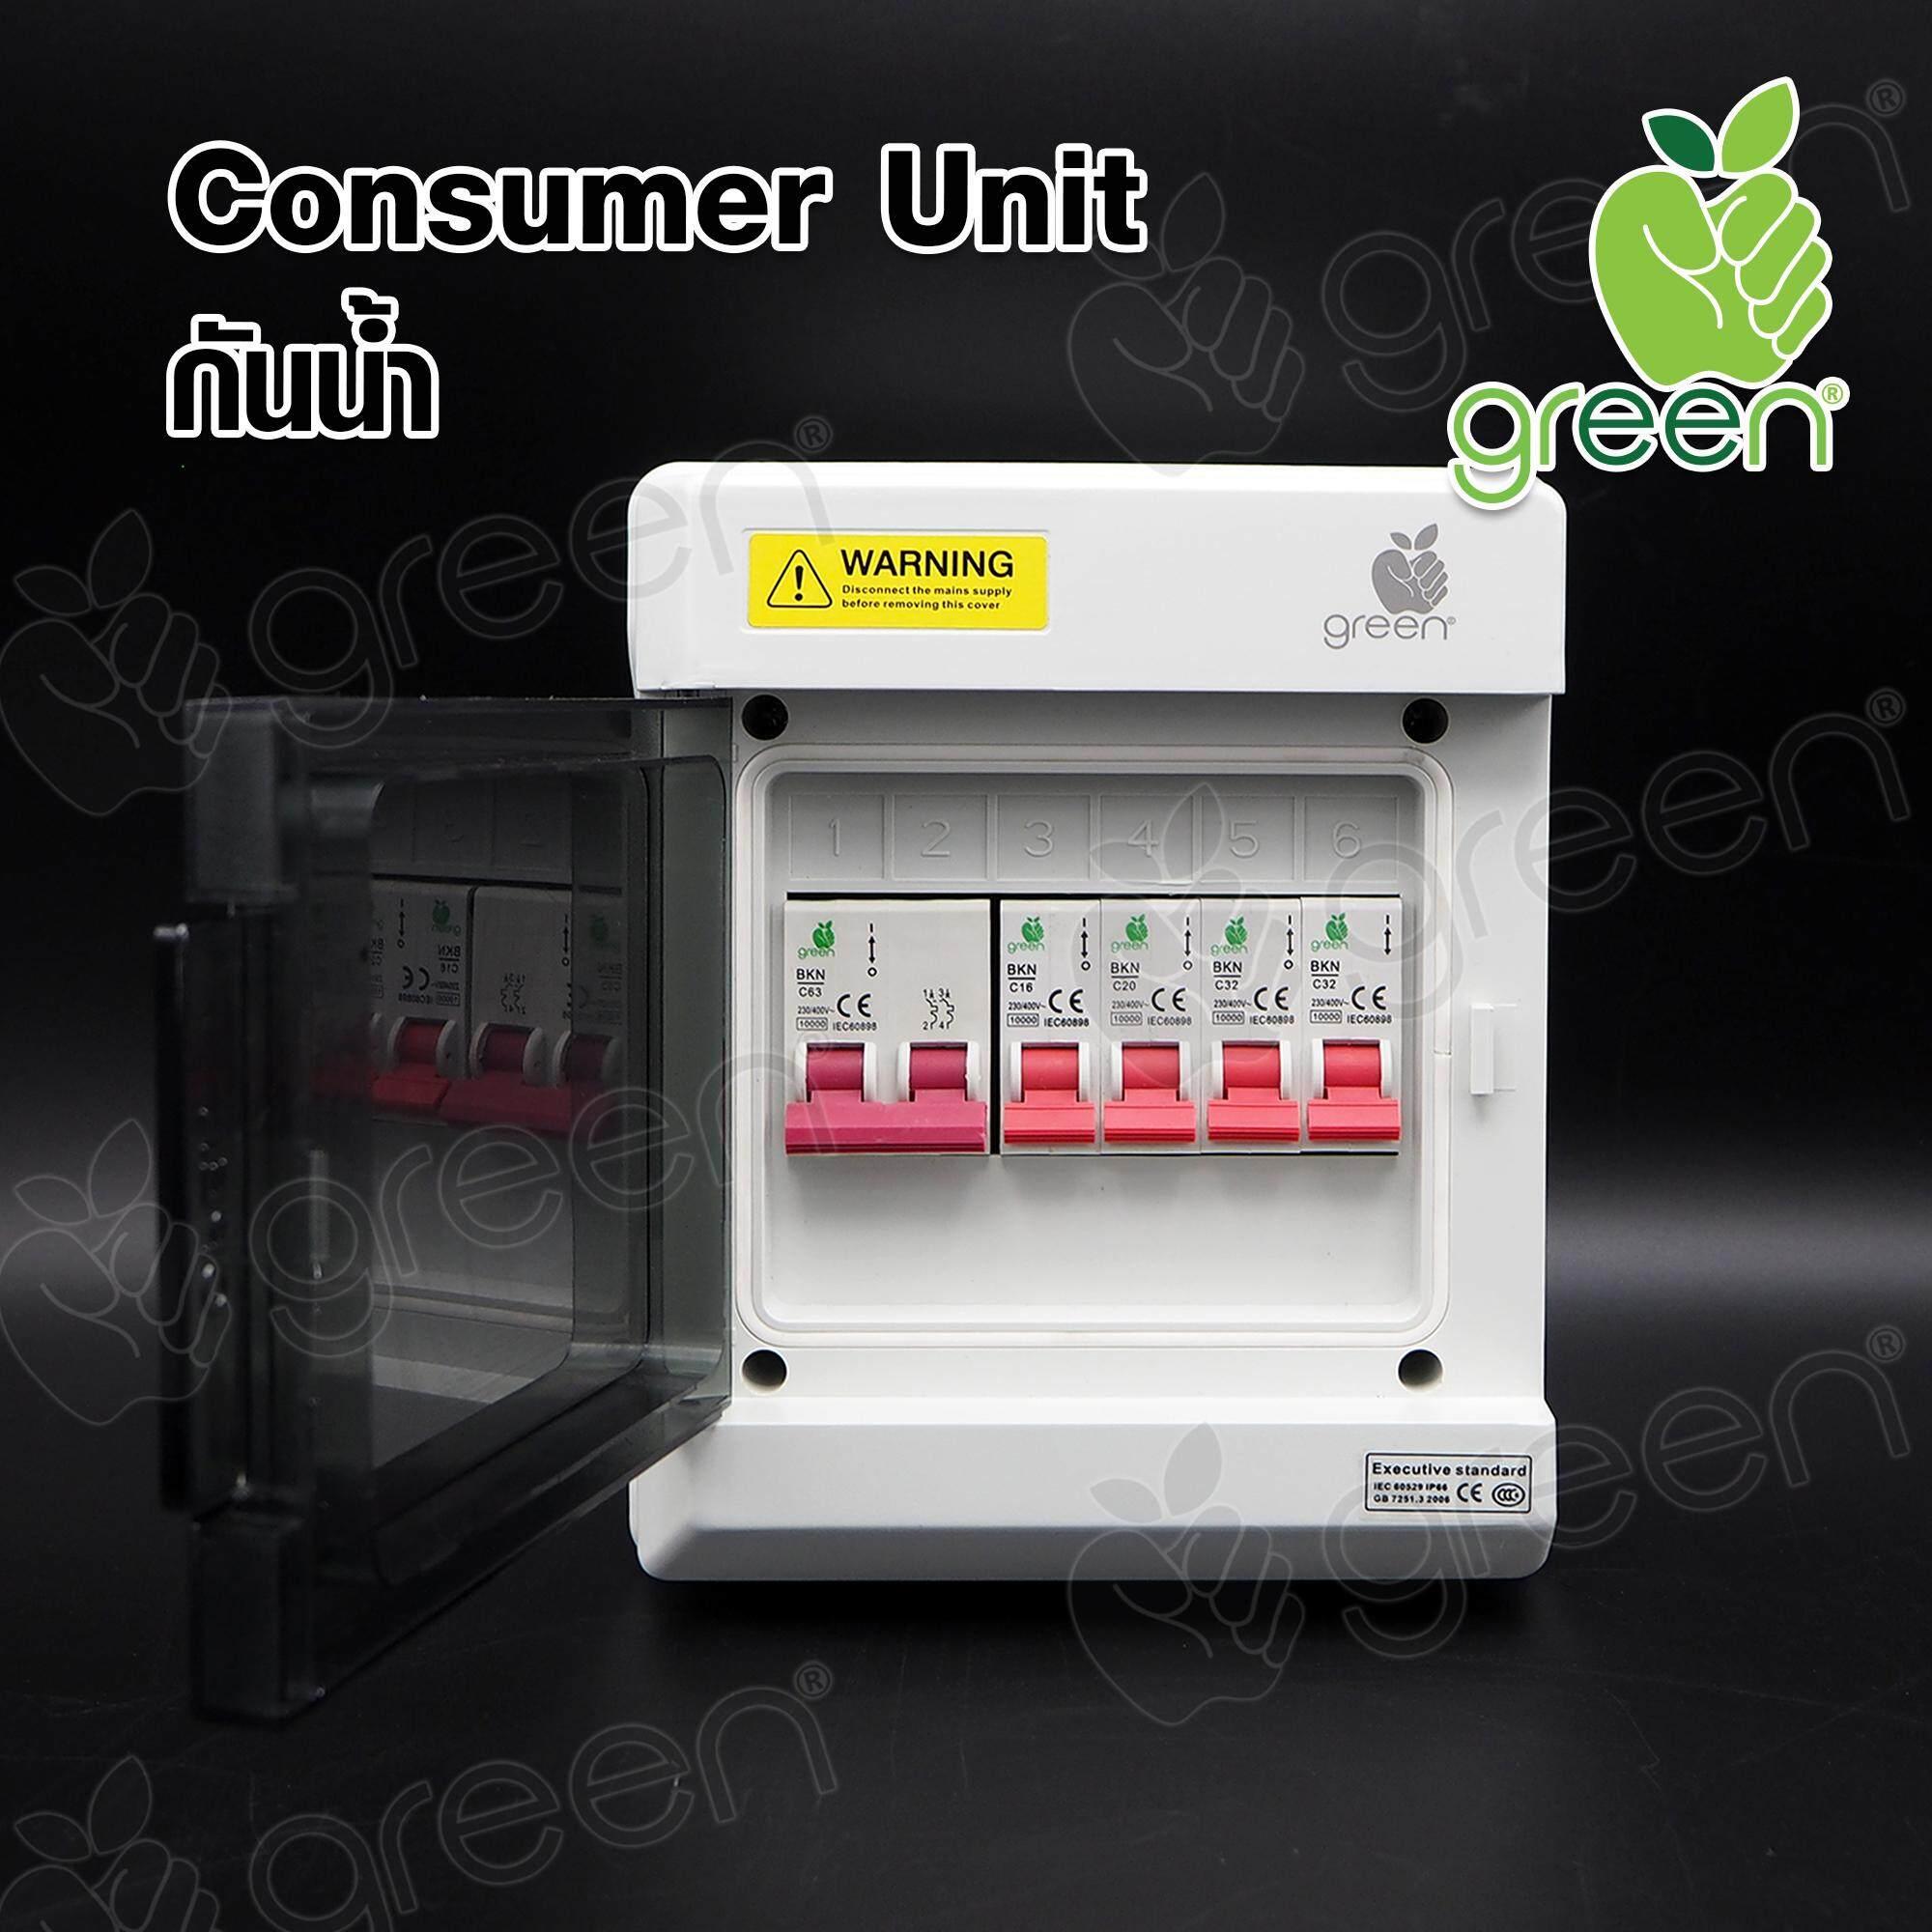 Applegreen Combiner Box Consumer Unit Ip65 Ac Breaker, เมนเซอกิต,ตู้โหลด ใช้กับไฟบ้าน กันน้ำ ใช้ภายนอกใน และ ภายนอกอาคาร สามารถเลือกสเปคนการประกอบได้.